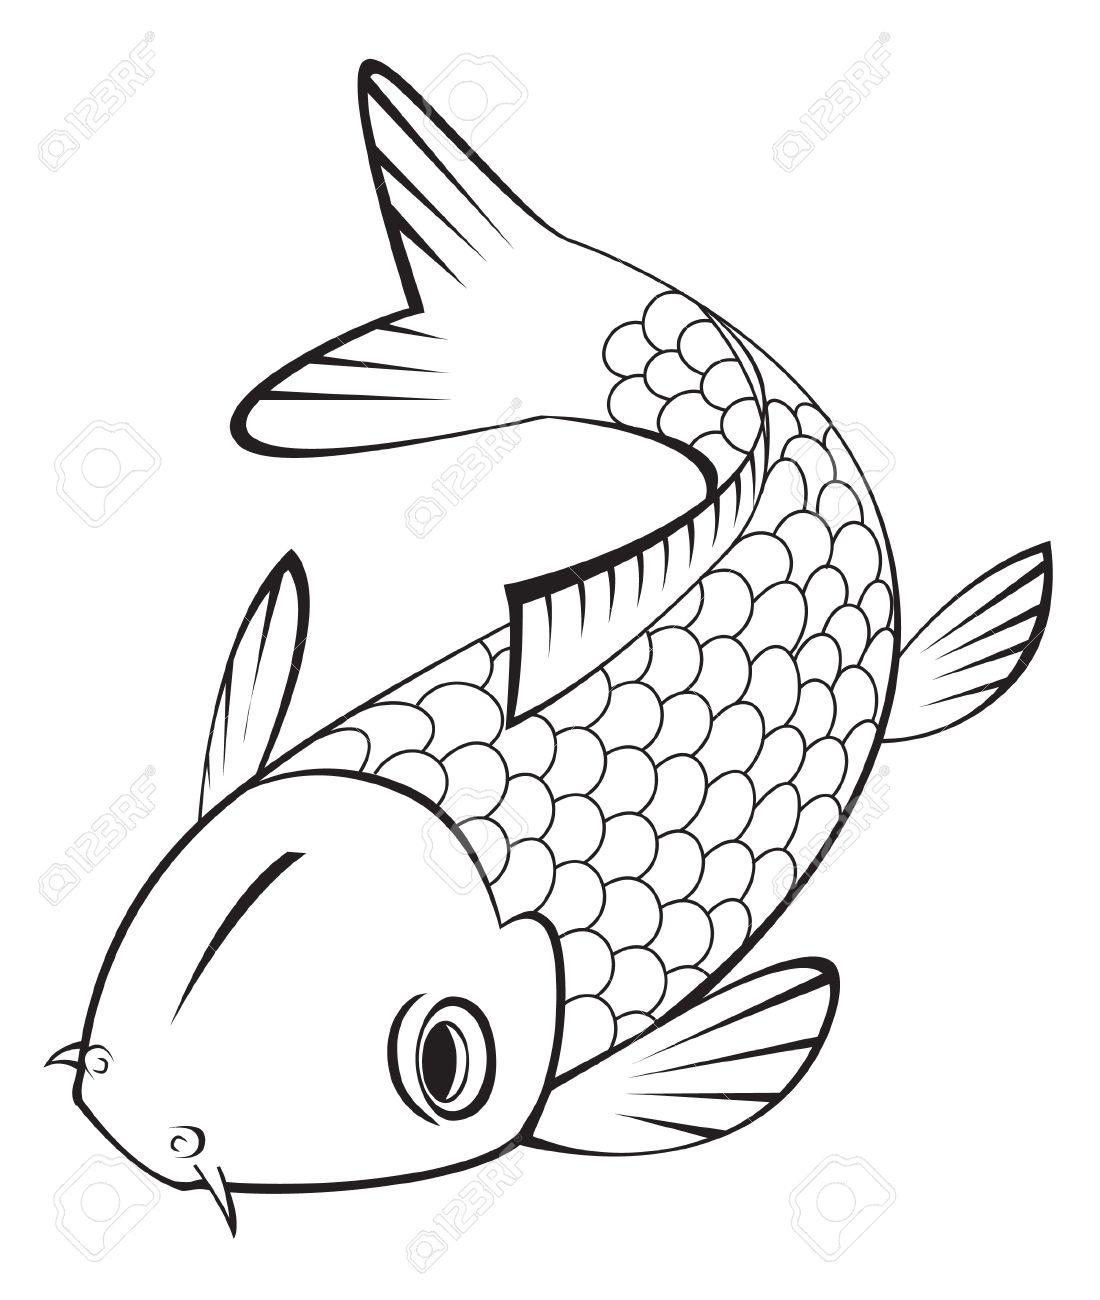 Koi Fish Outline Drawing At Getdrawings